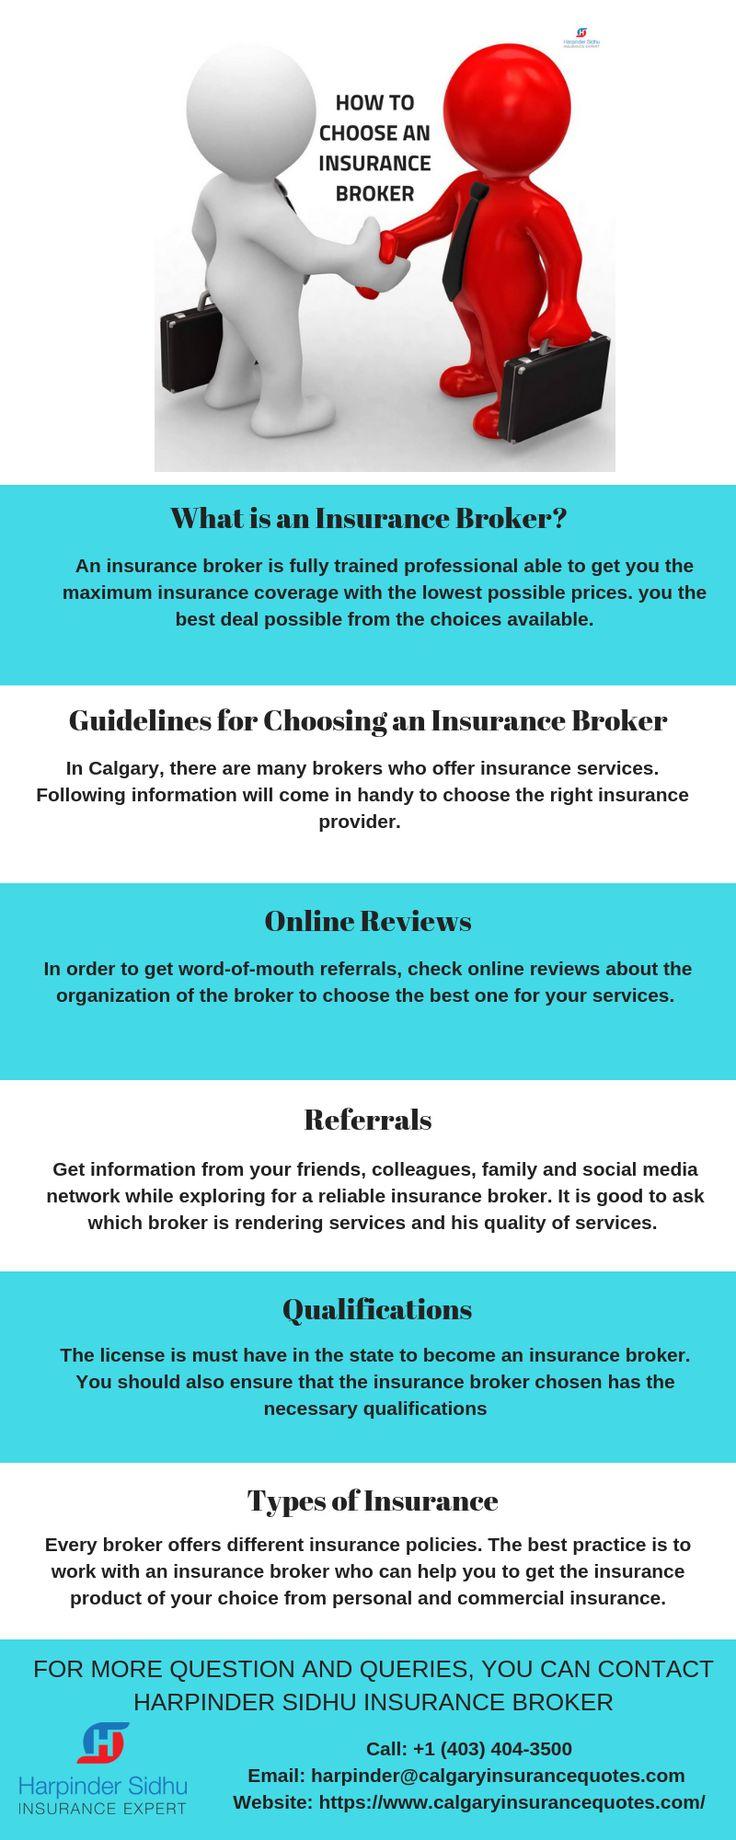 How to Choose an Insurance Broker